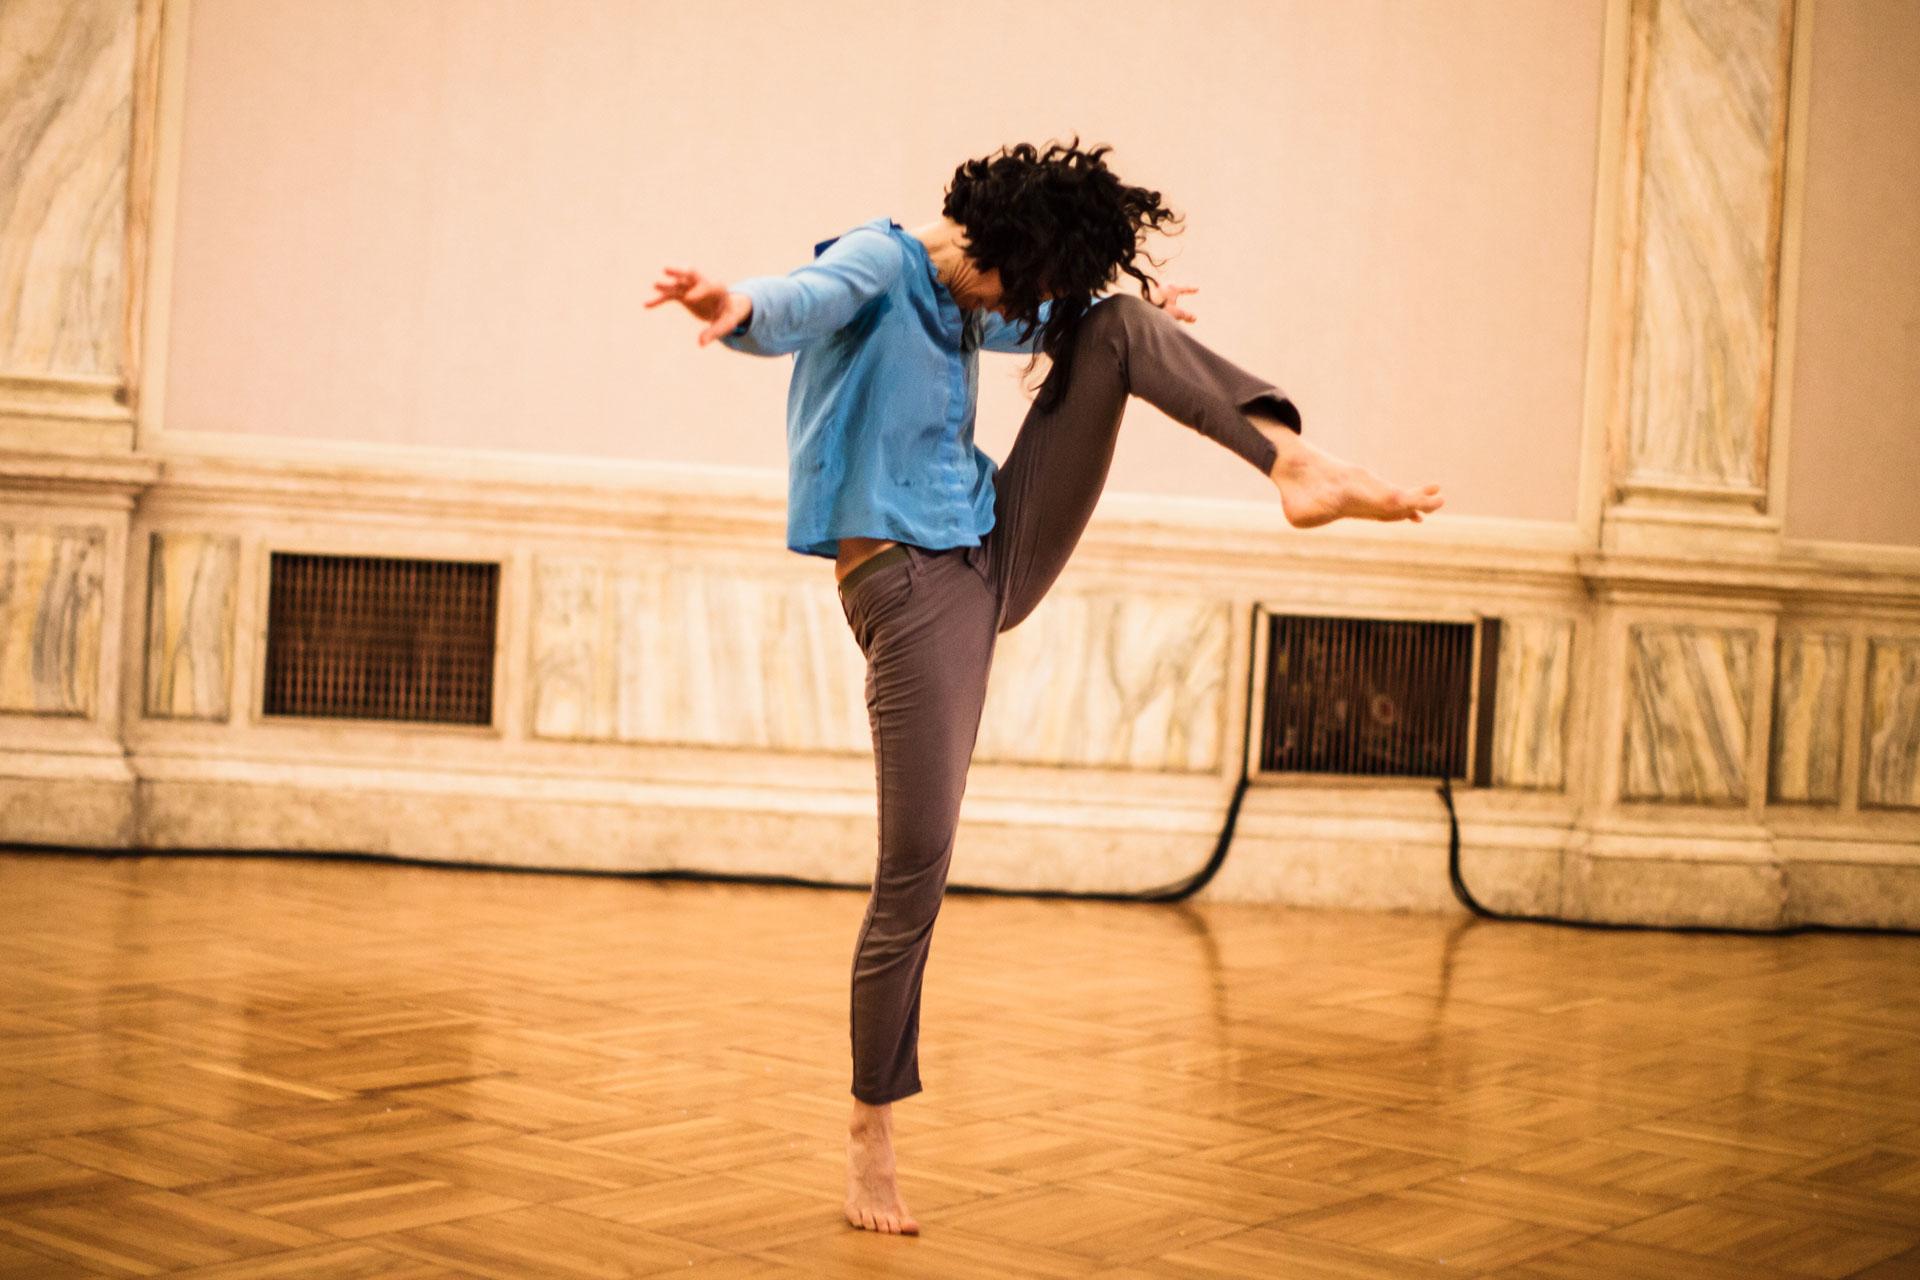 http://www.danzaurbana.eu/festival/wp-content/uploads/caterina-basso.jpg